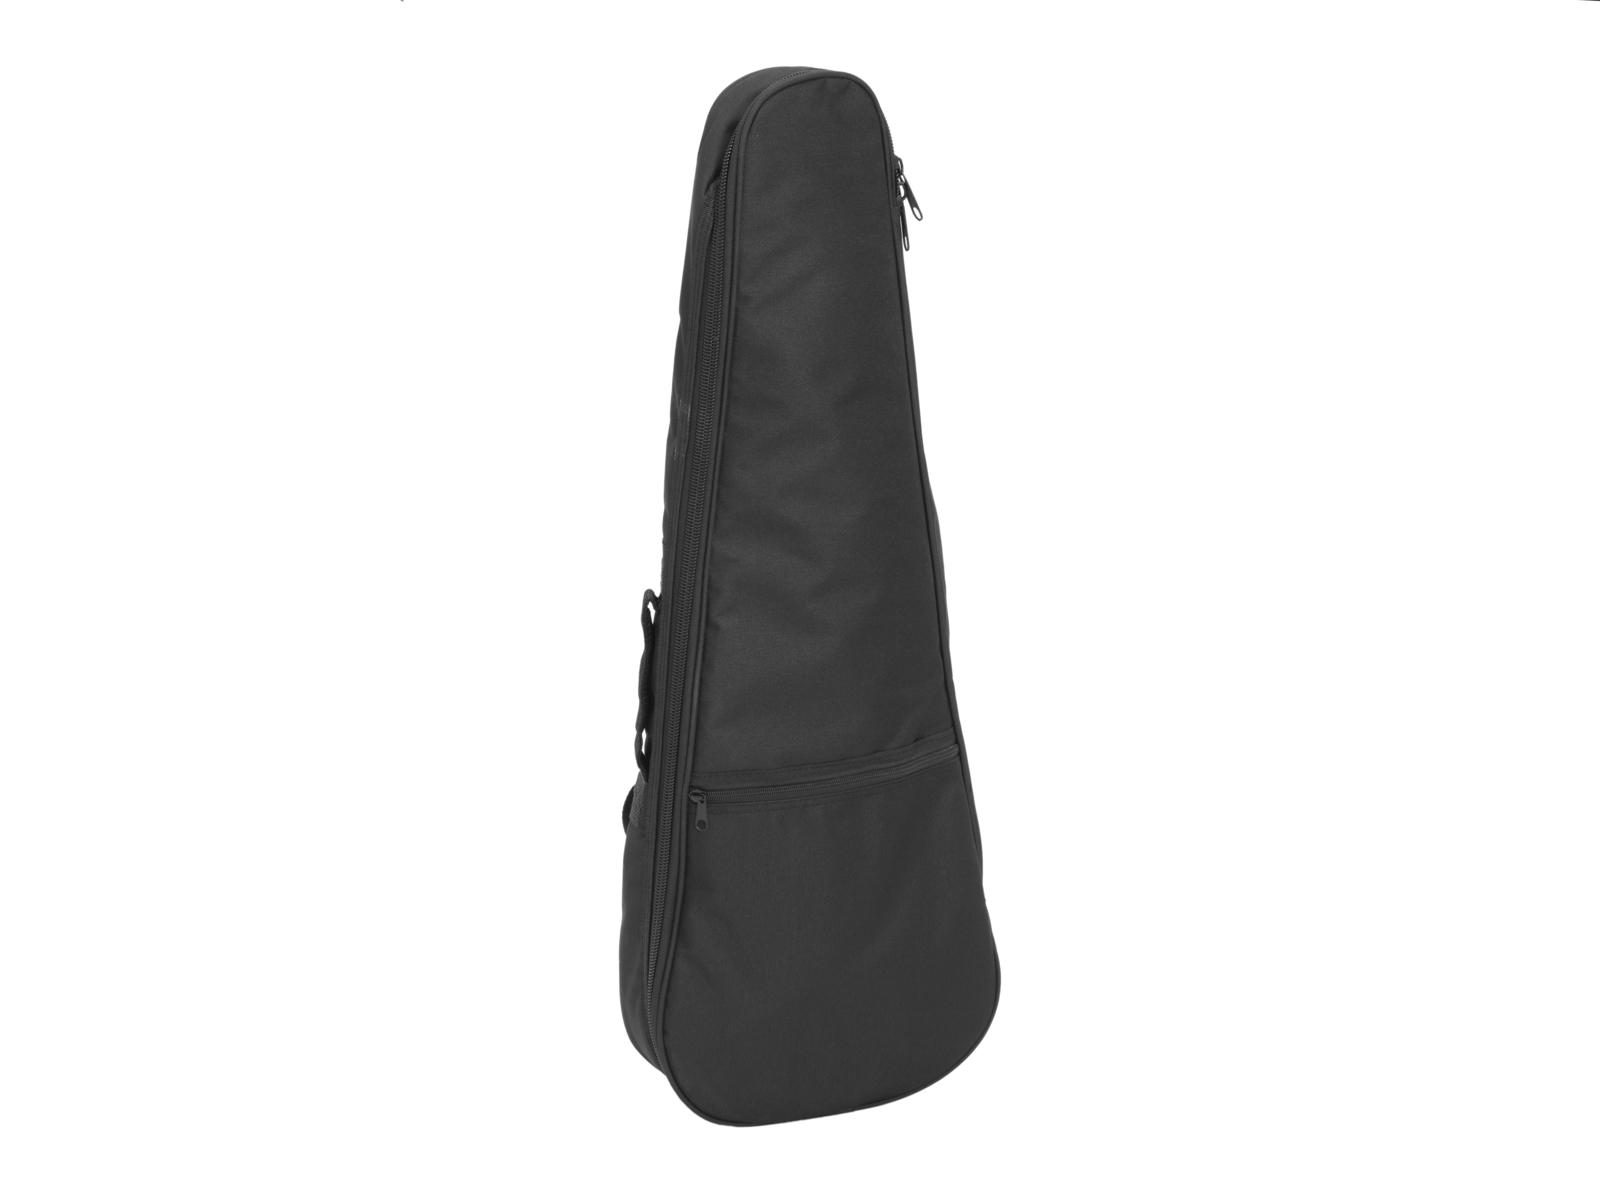 DIMAVERY Soft-Bag für Bass Ukulele 5mm